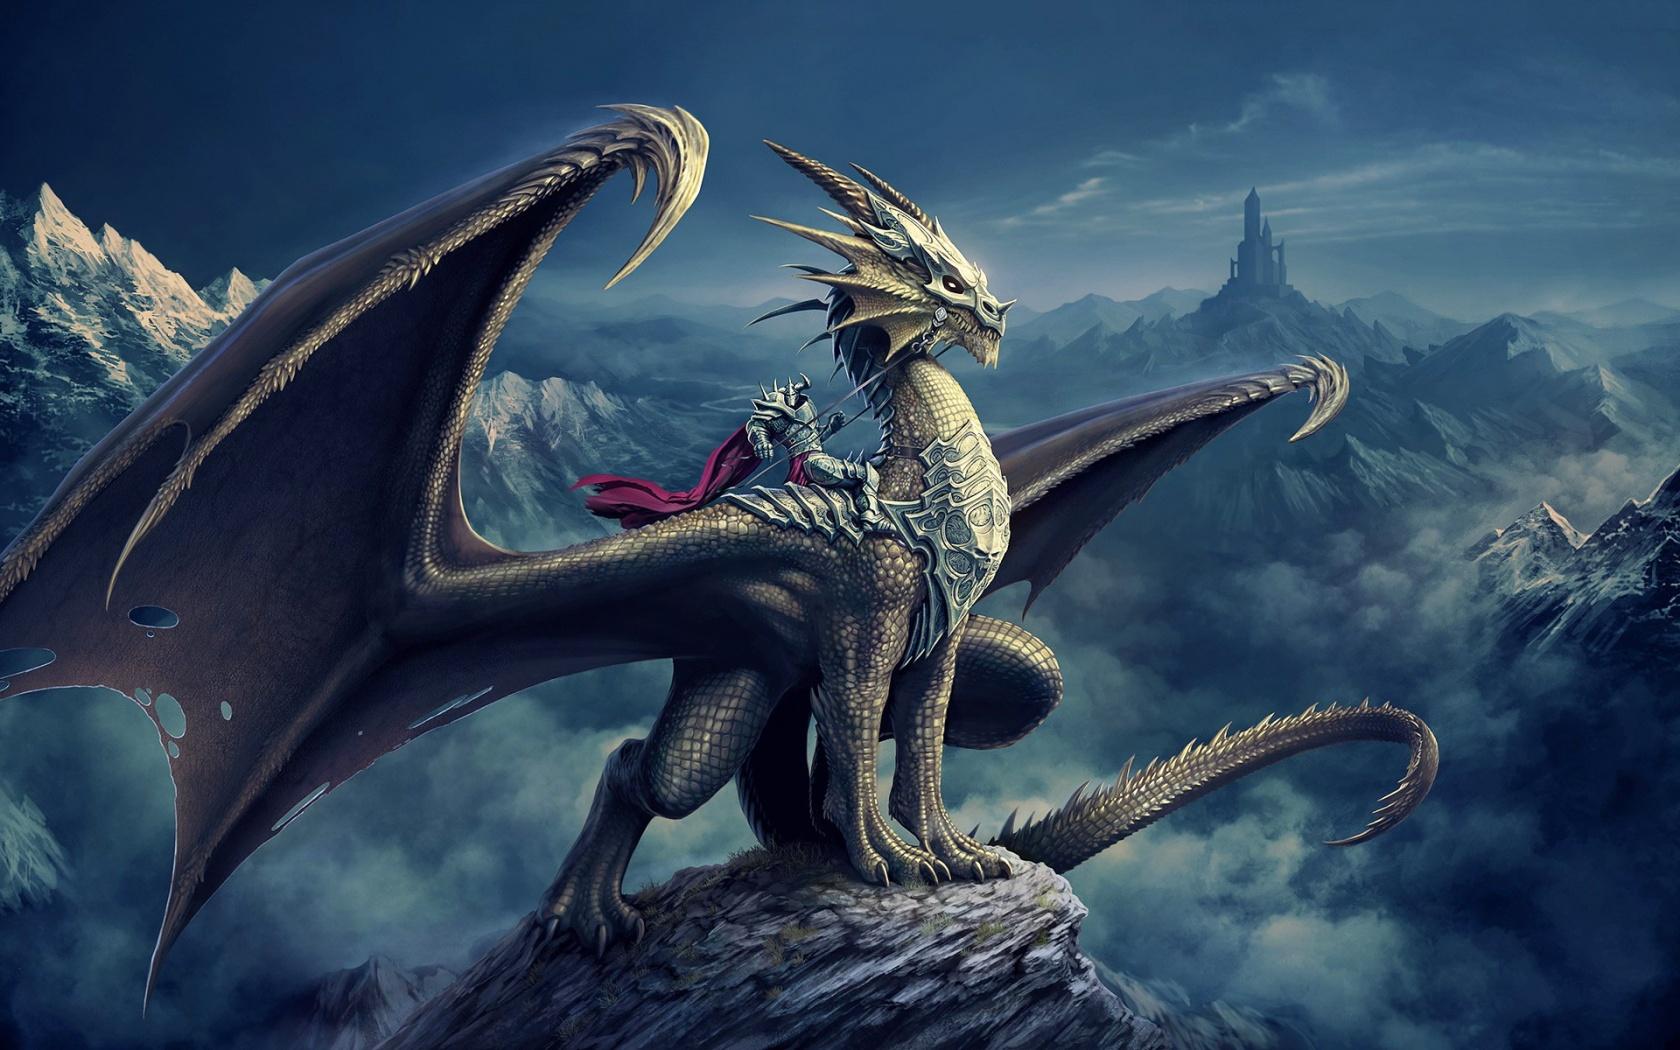 High Resolution Wallpaper | Dragon 1680x1050 px